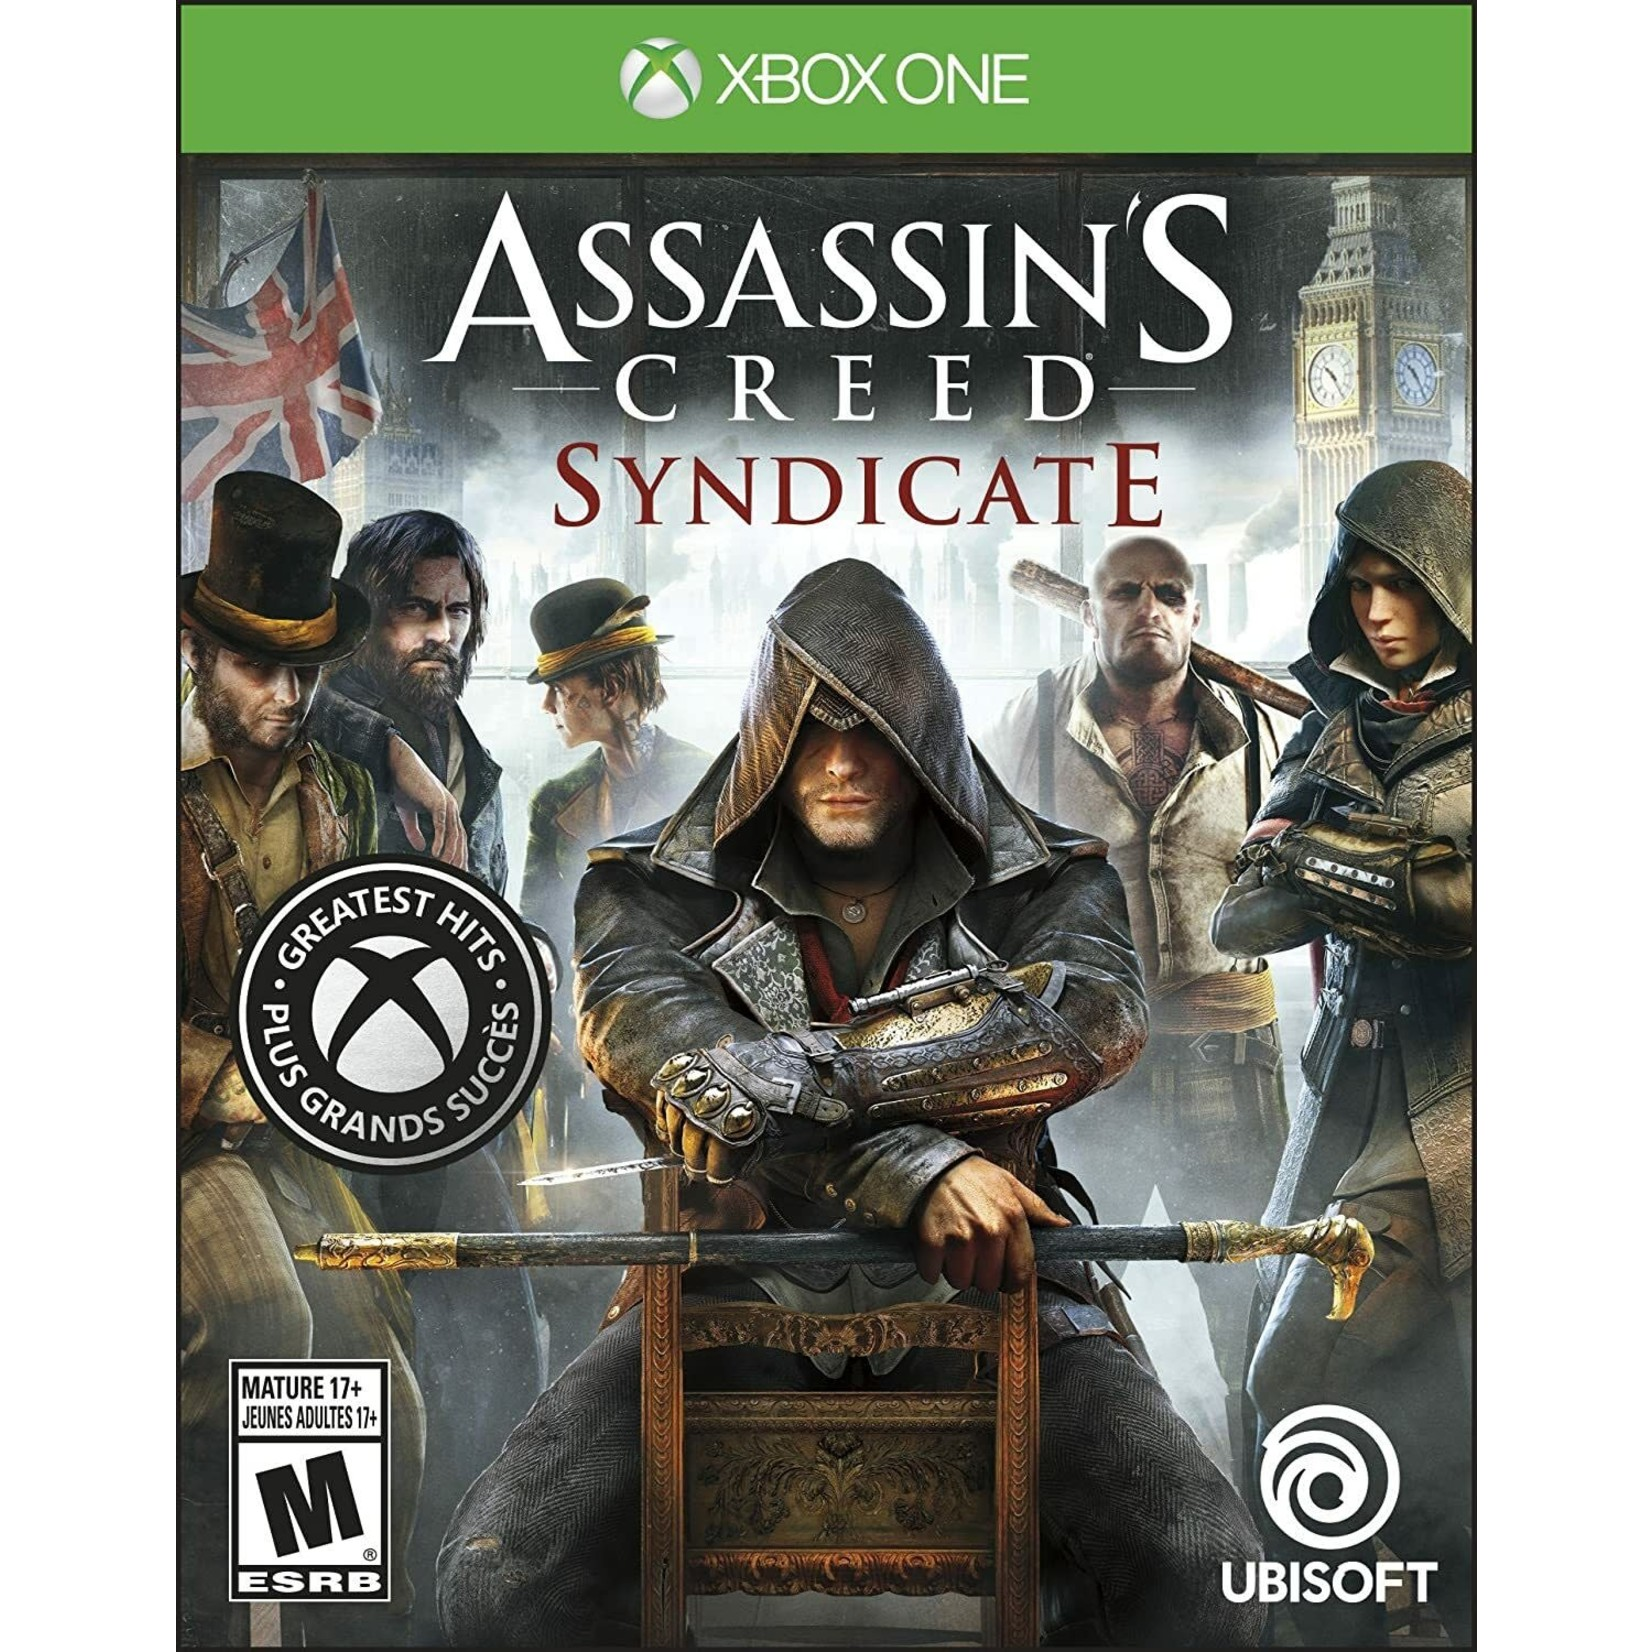 XB1U-Assassin's Creed Syndicate